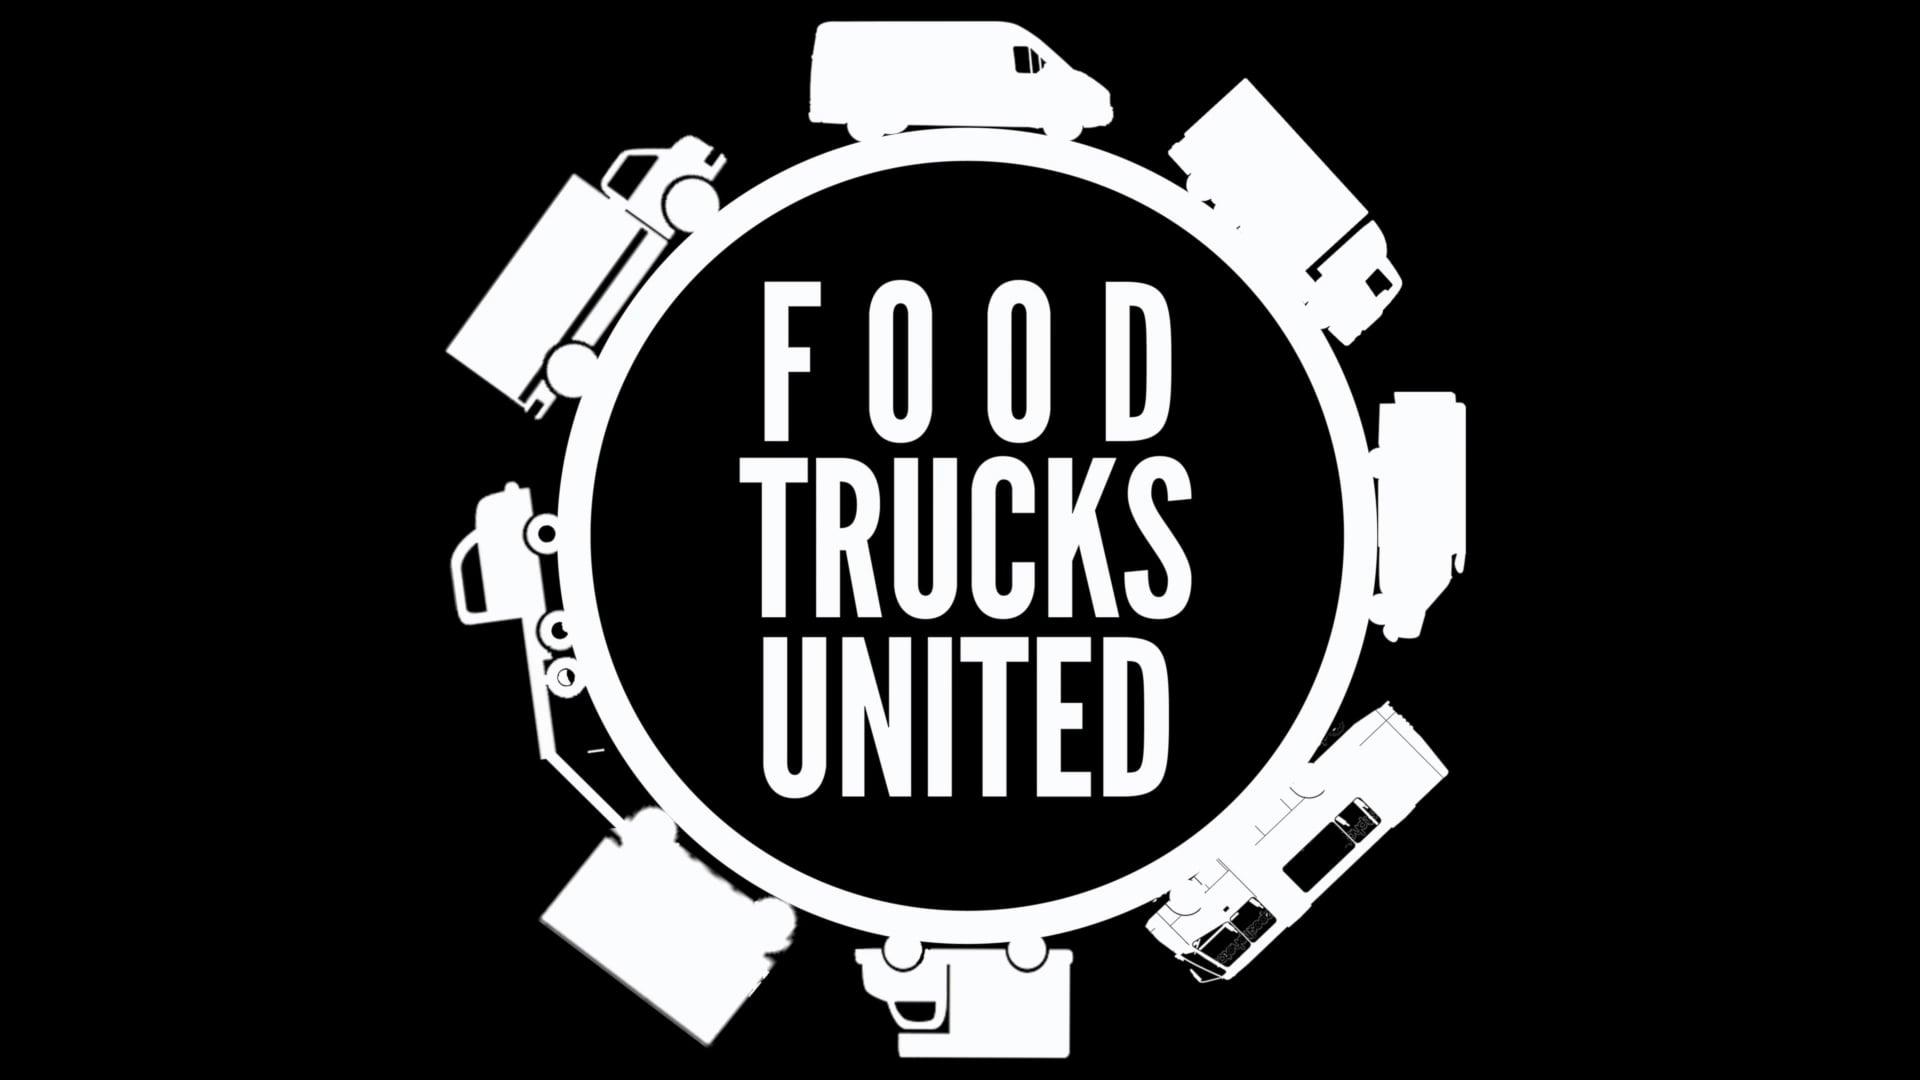 Event Shoot | Food Trucks United